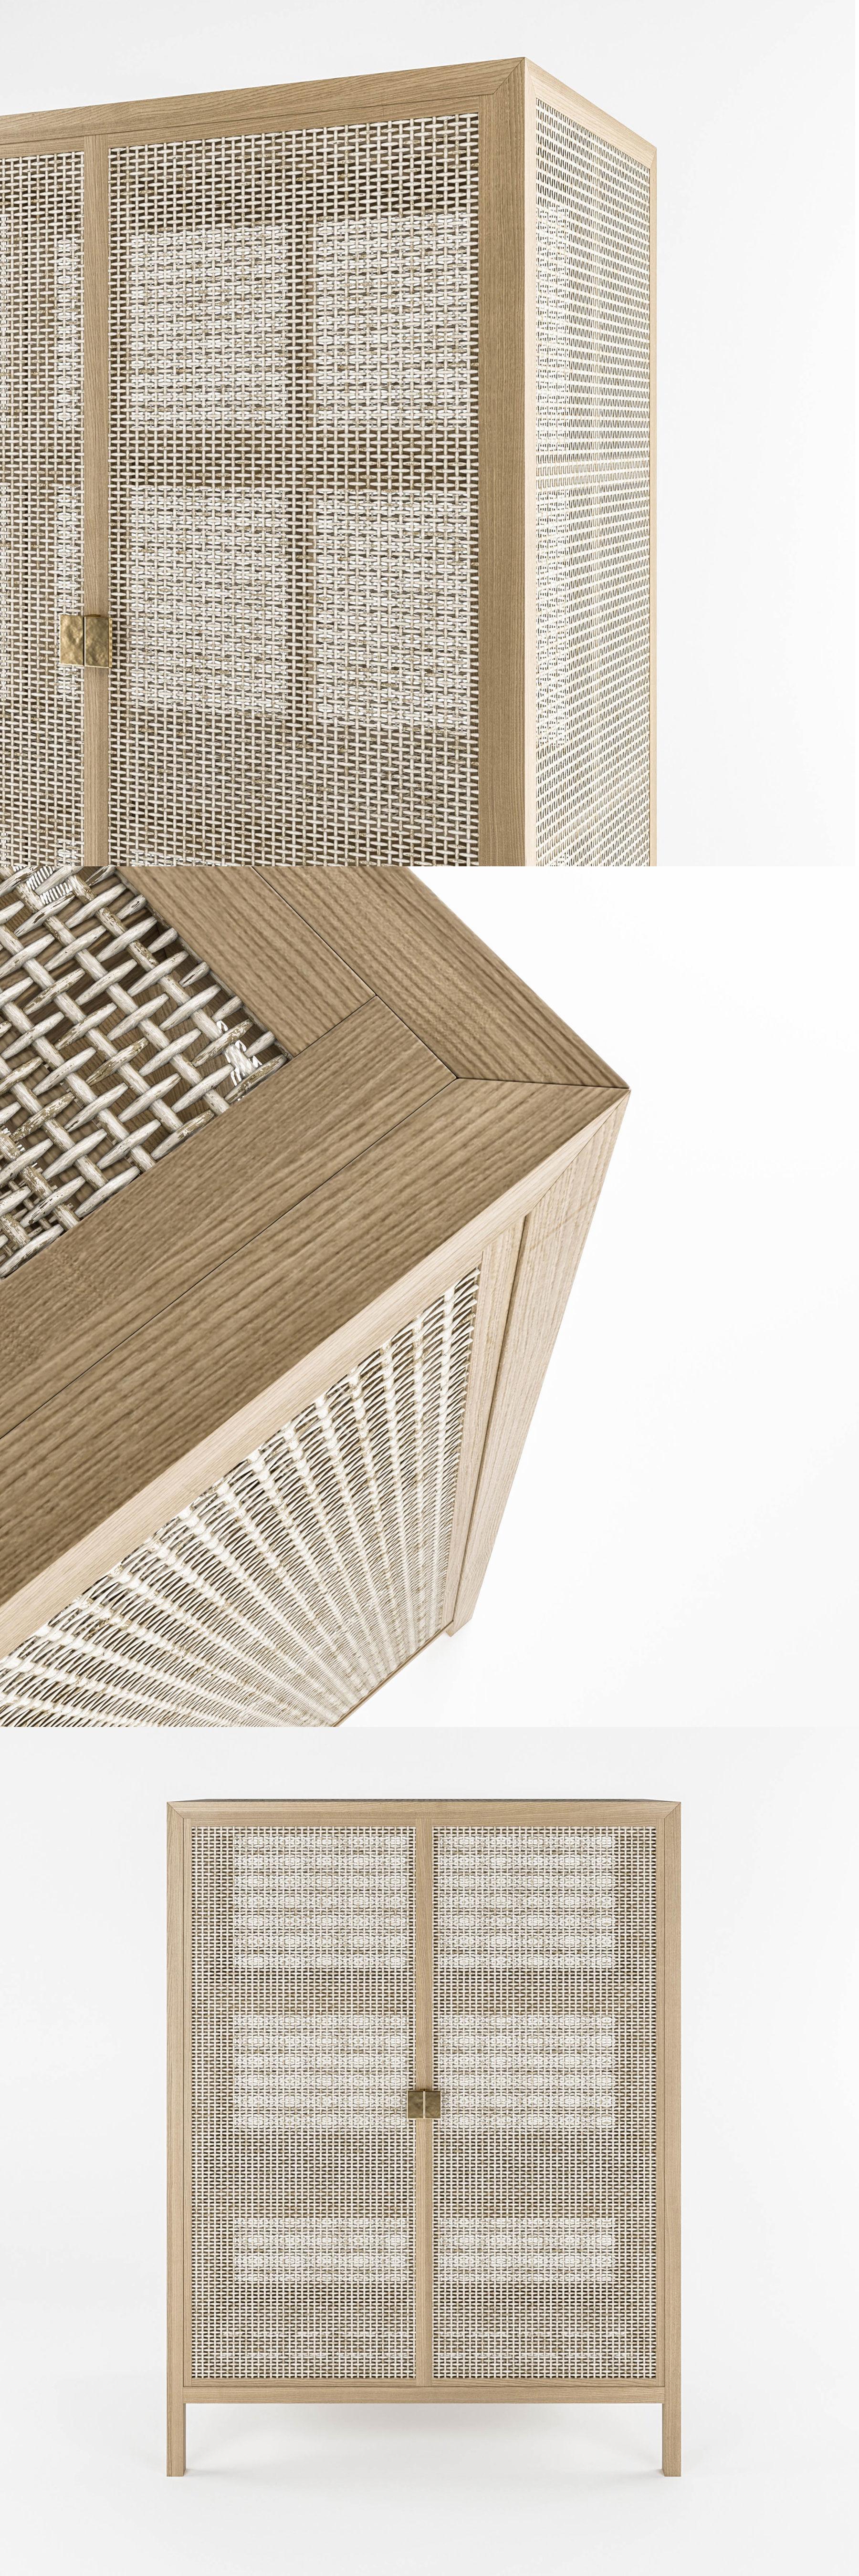 Ikea Stockholm Wicker Chest Of Drawer Model Max Obj Mtl Fbx